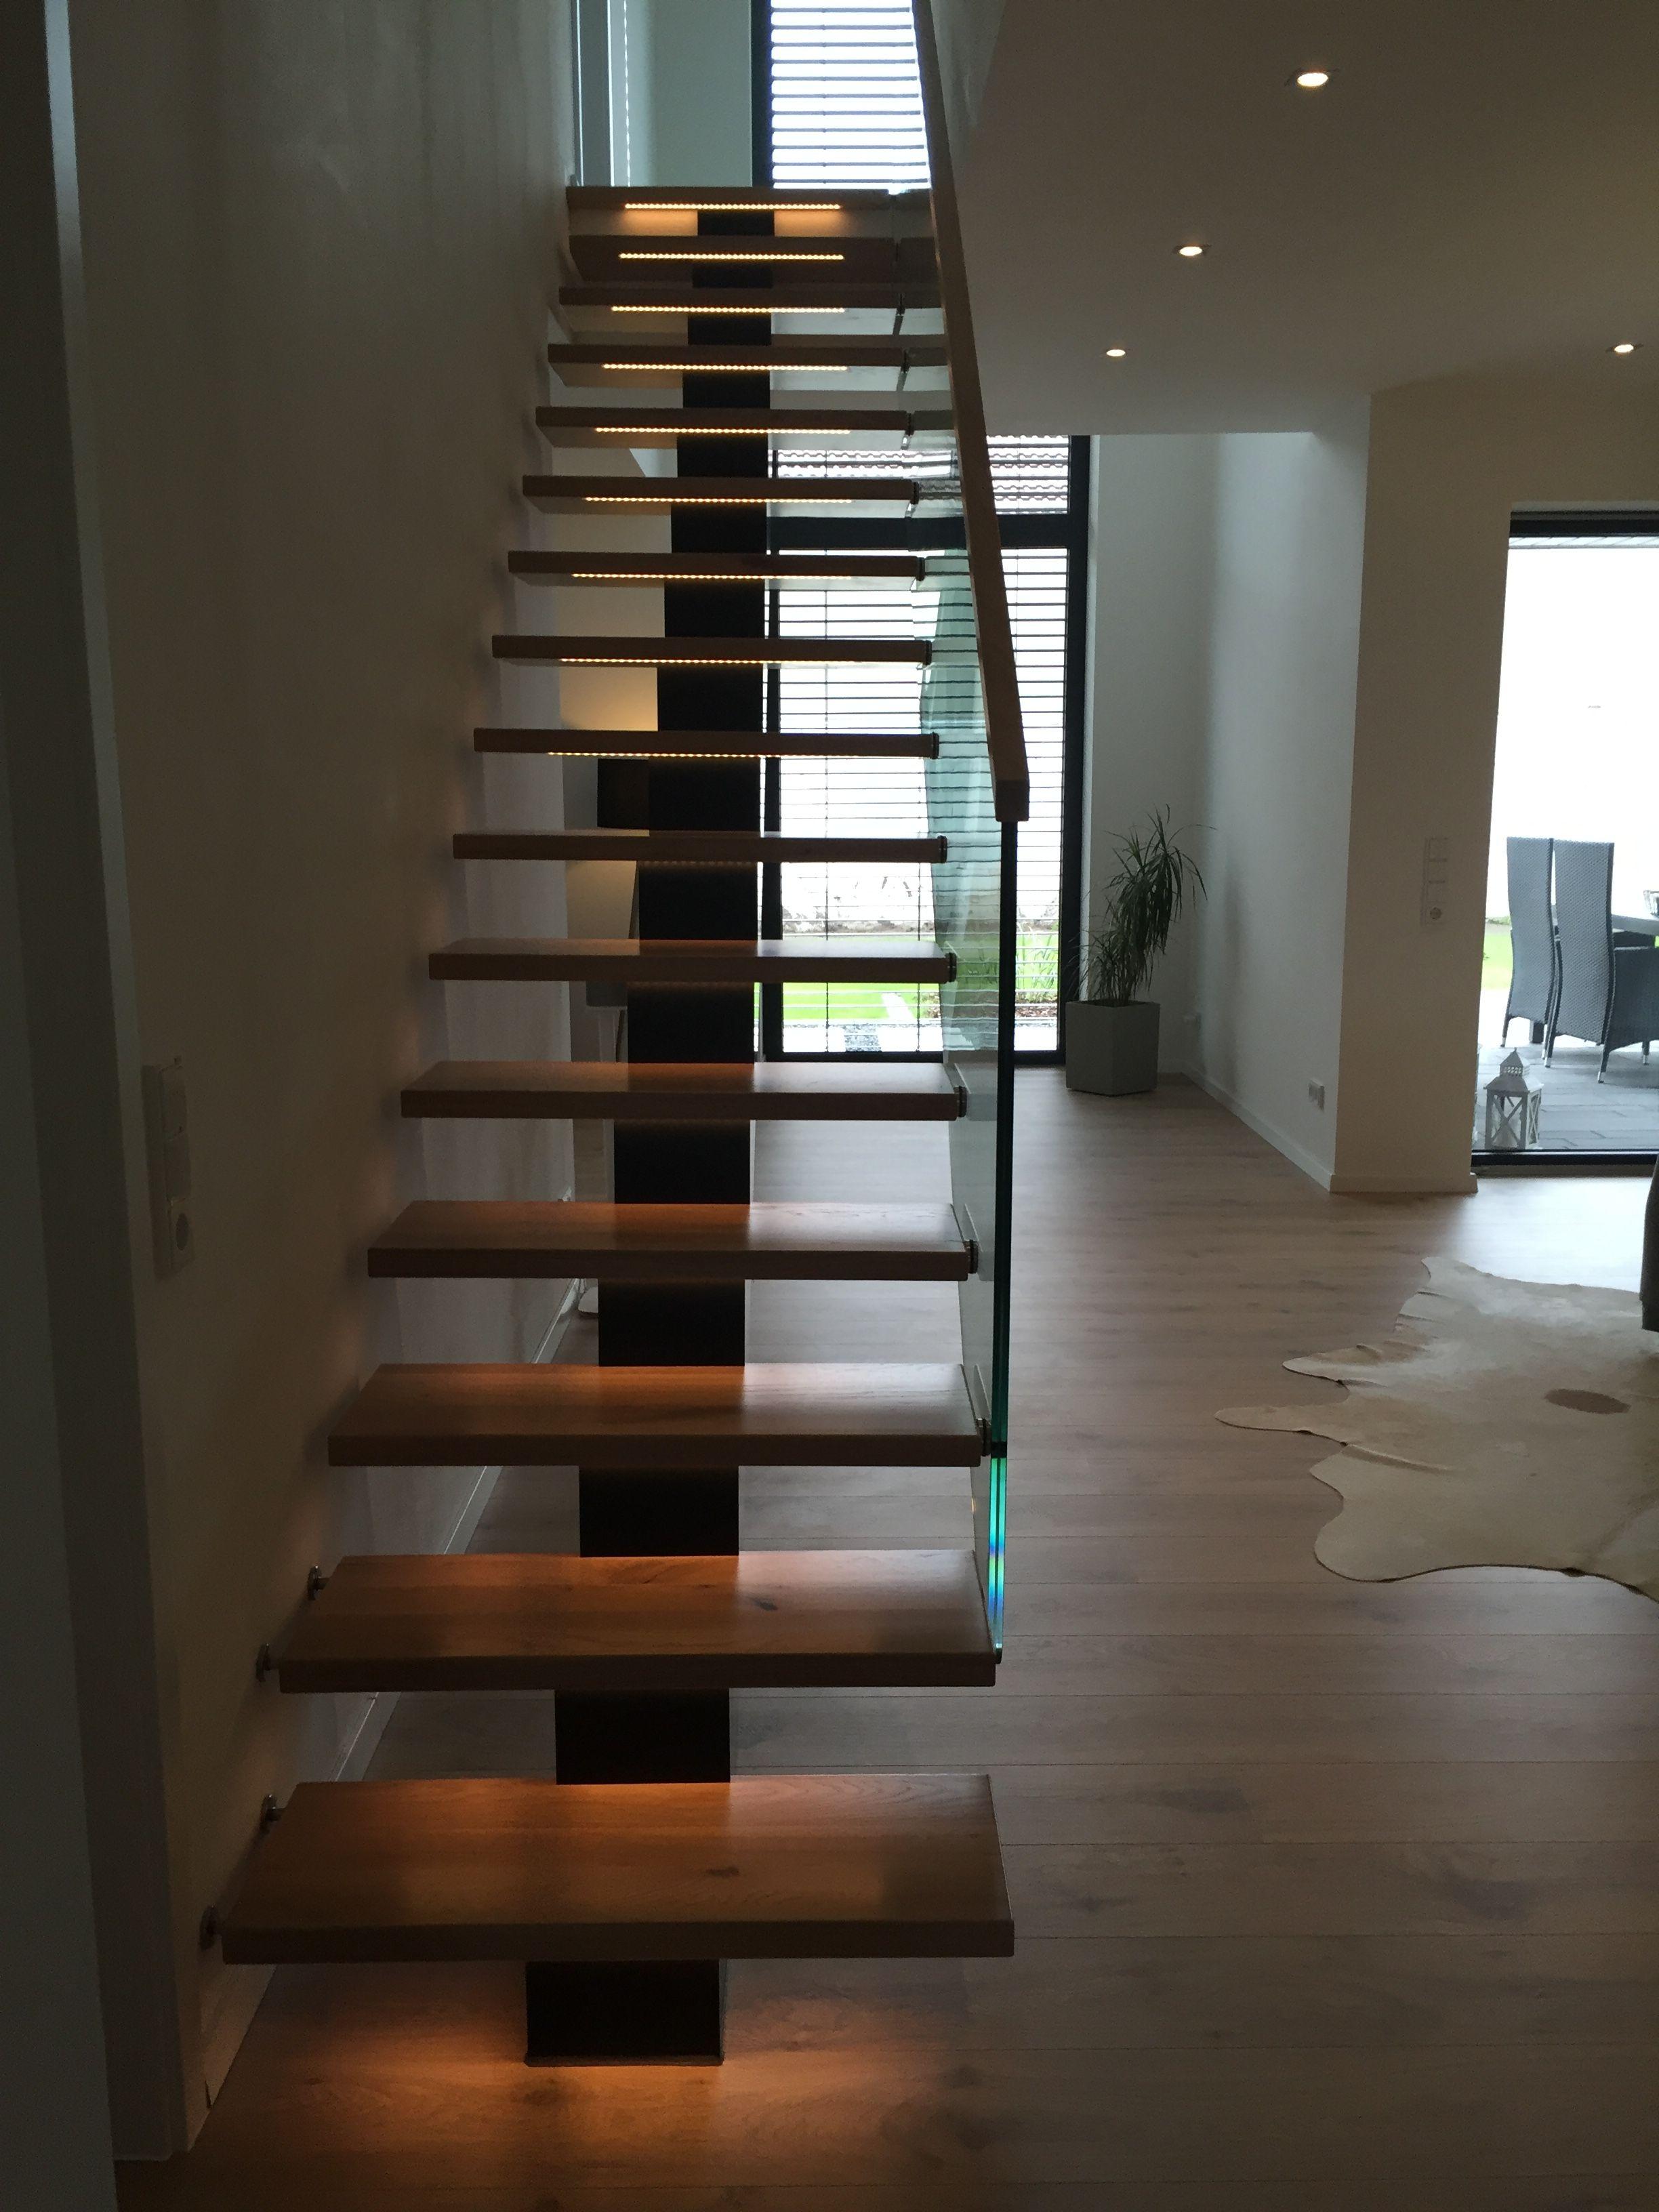 mittelholmtreppe mit glasgel nder und led beleuchtung treppe pinterest stairs open stairs. Black Bedroom Furniture Sets. Home Design Ideas